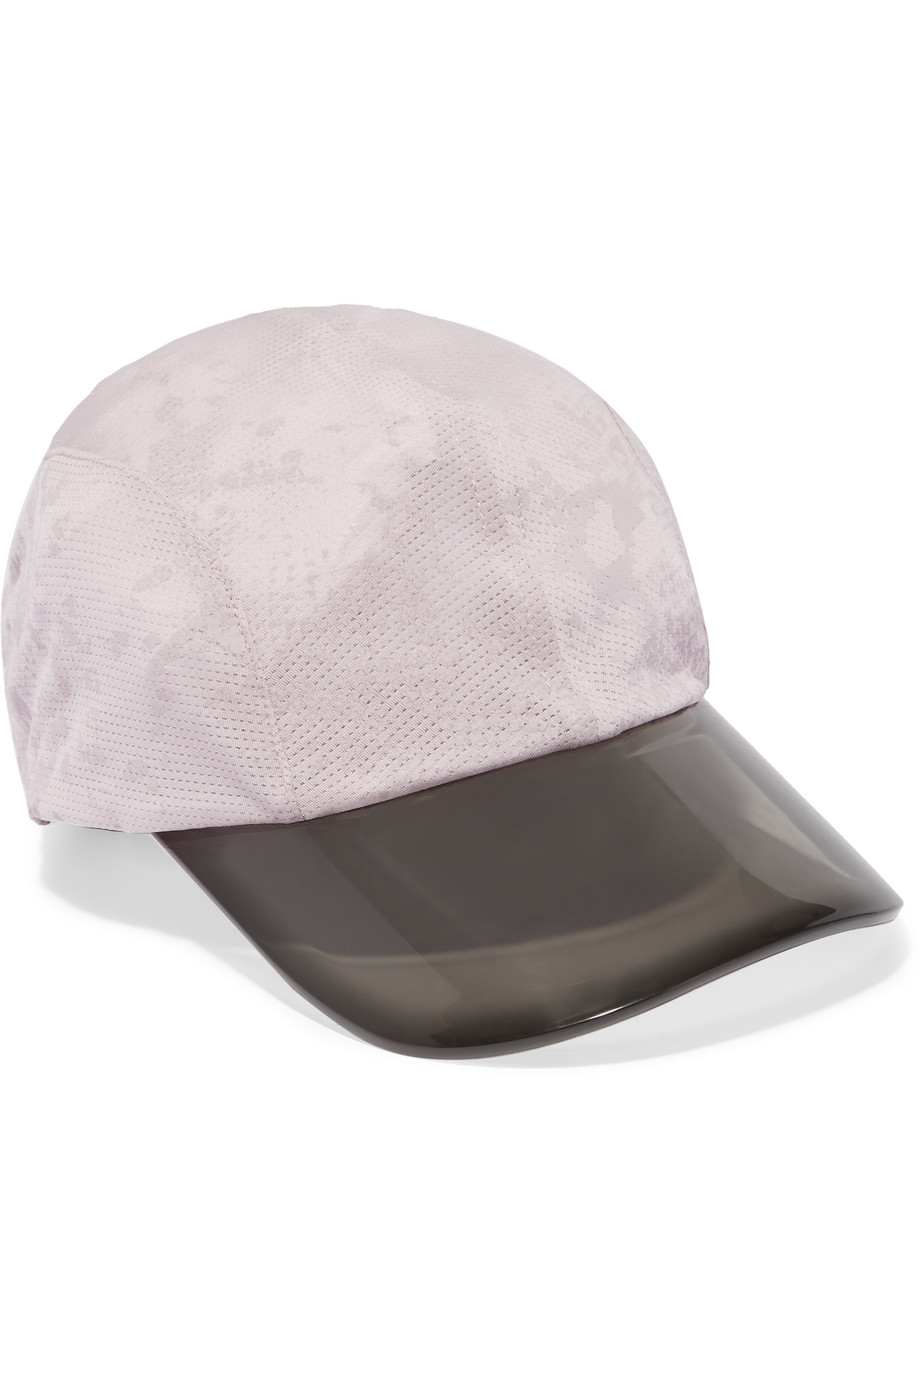 Printed Stretch-Mesh Cap, Adidas by Stella Mccartney, Light Gray, Women's, Size: One size